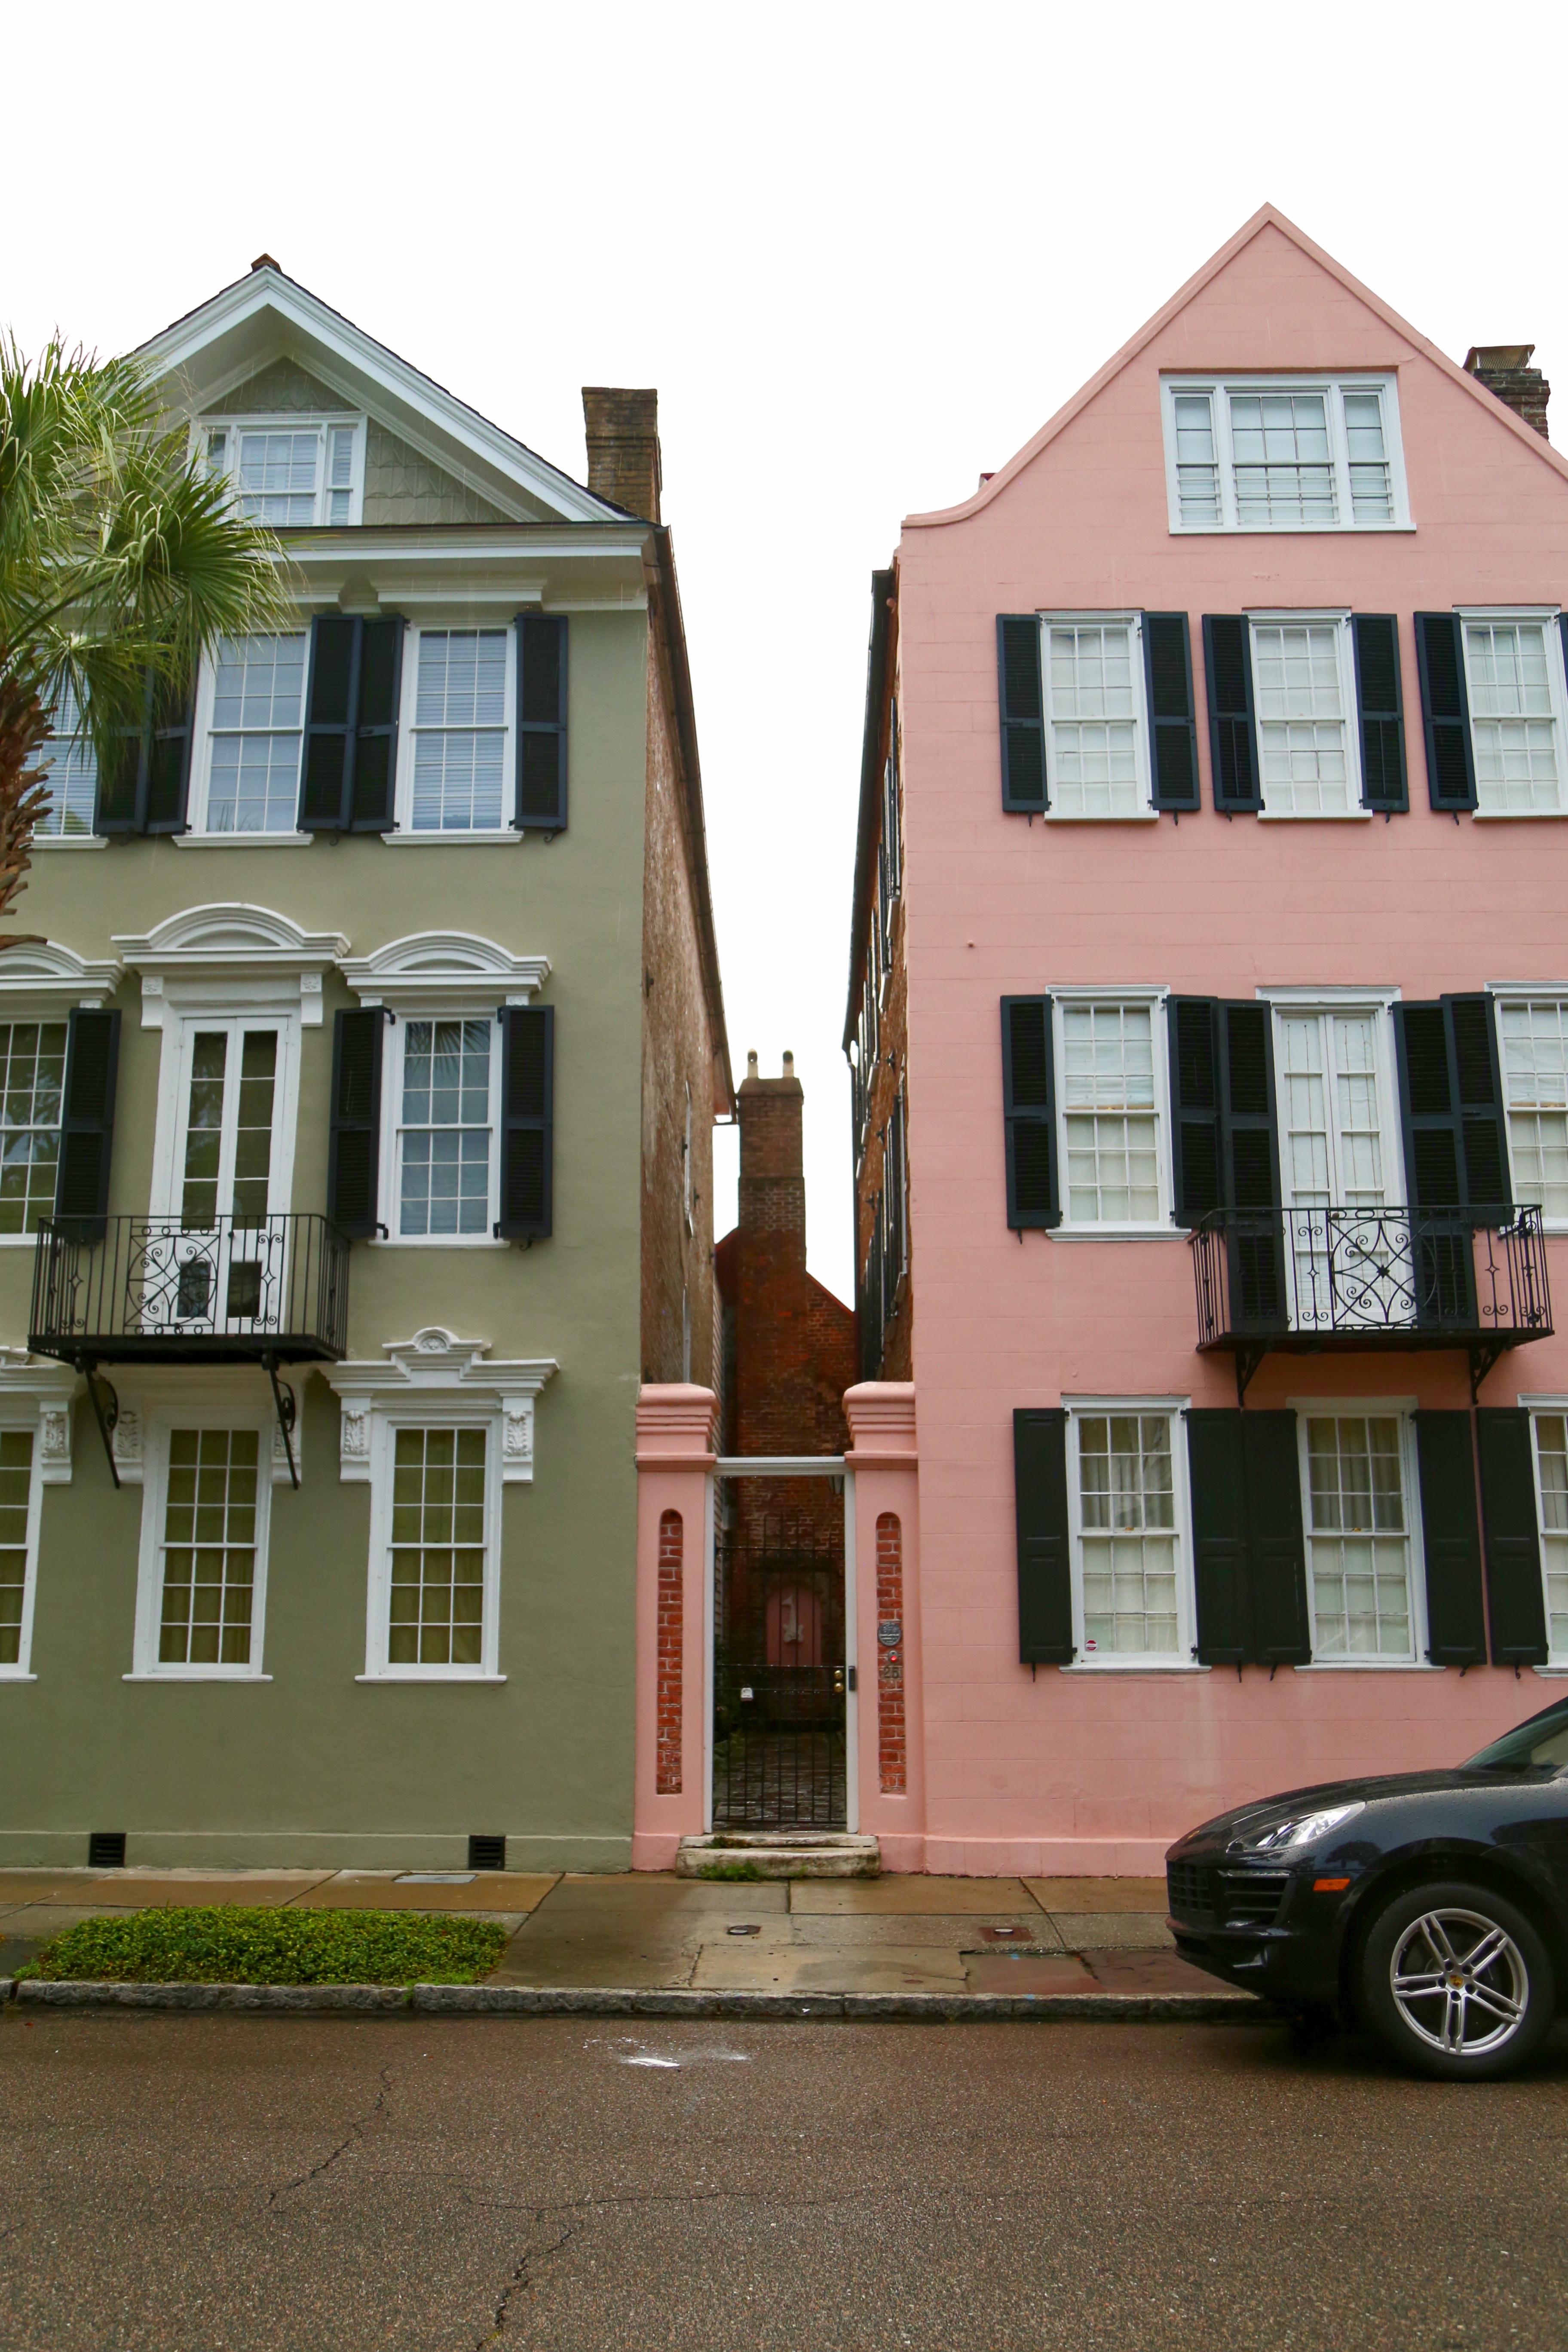 The Ultimate Weekend in Charleston, South Carolina